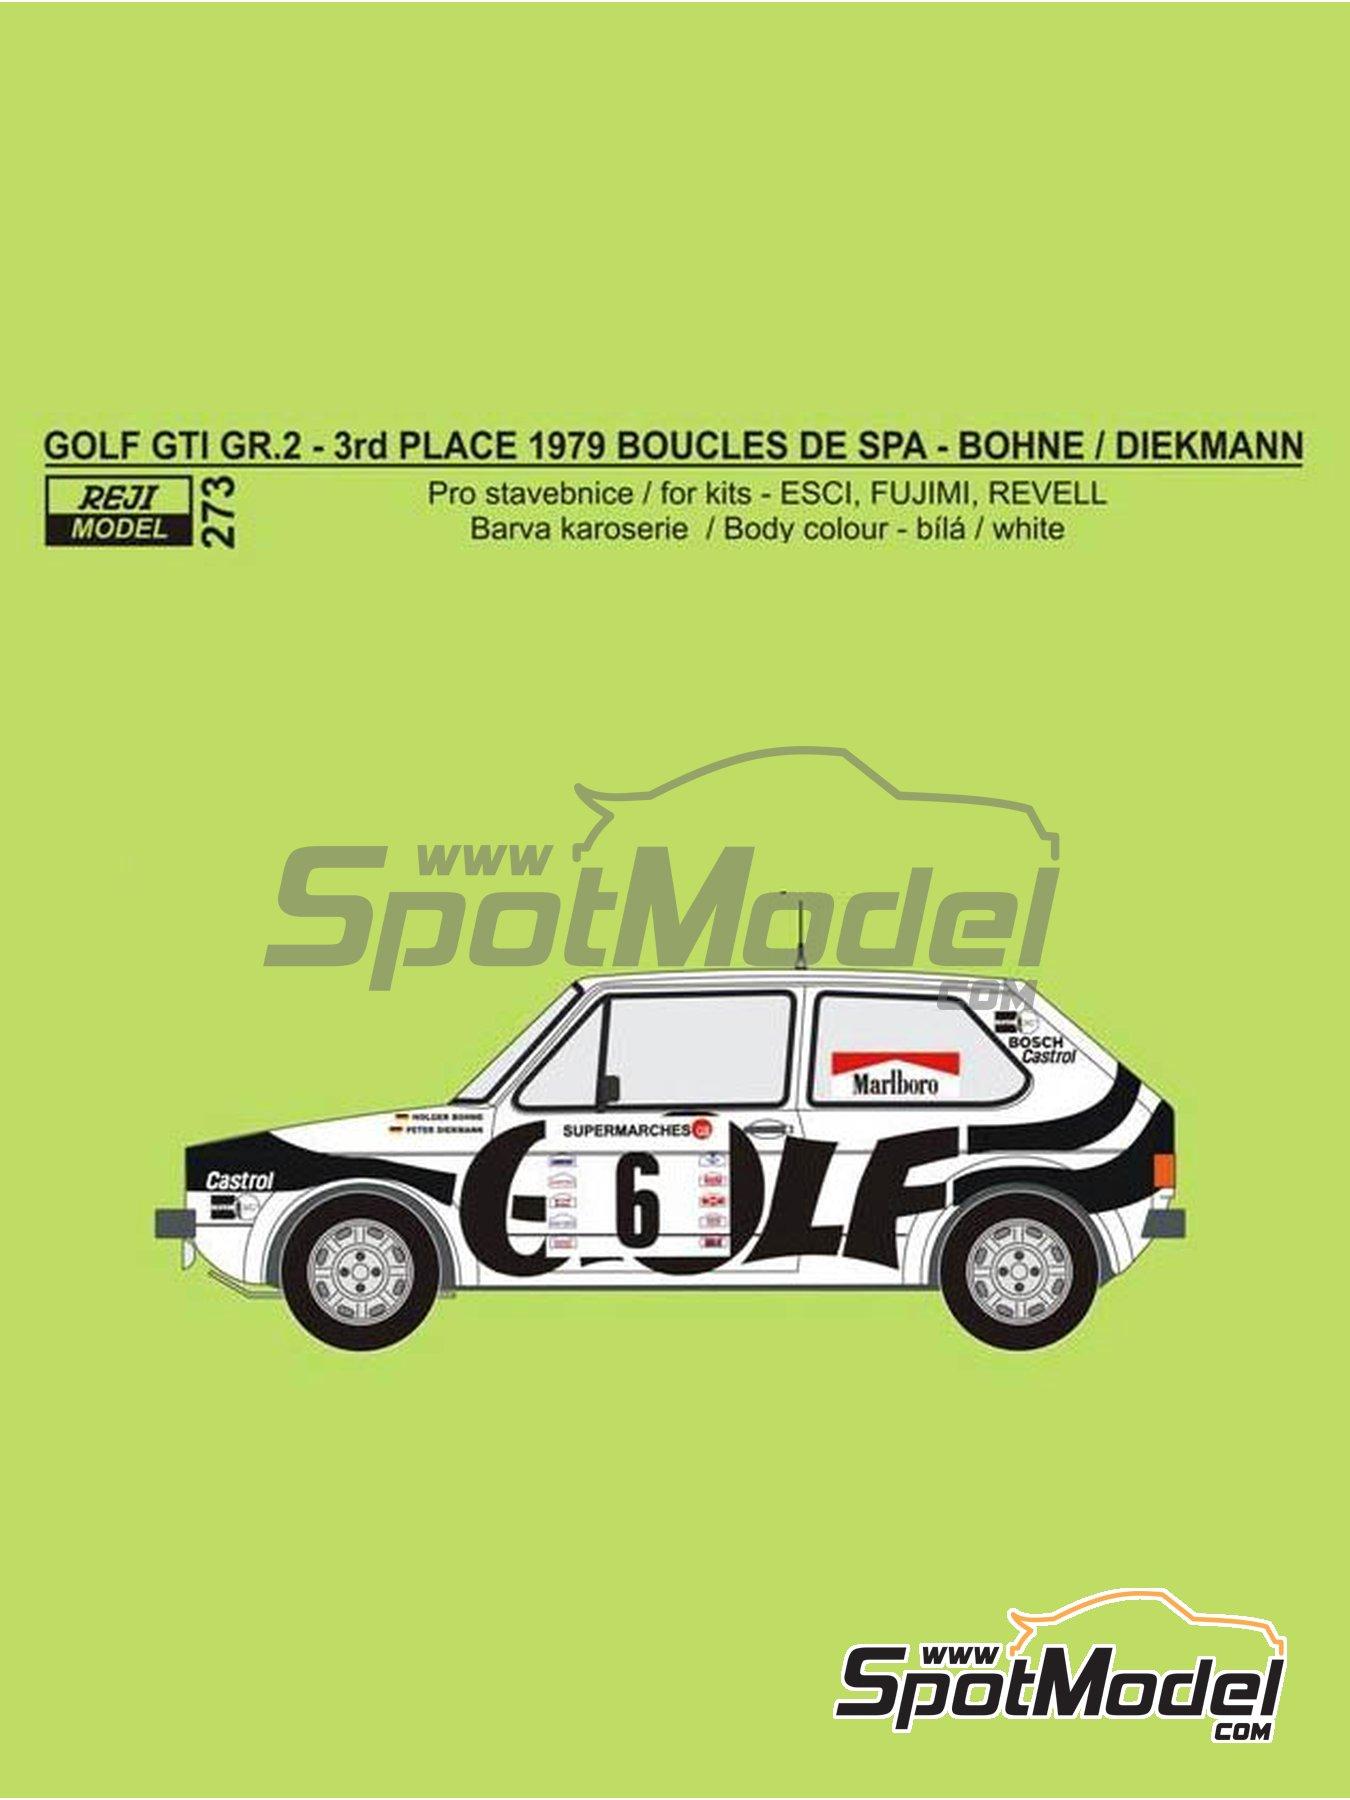 Volkswagen Golf GTI Mk I Group 2 Marlboro - Boucles de SPA 1979 | Marking / livery in 1/24 scale manufactured by Reji Model (ref.REJI-273) image